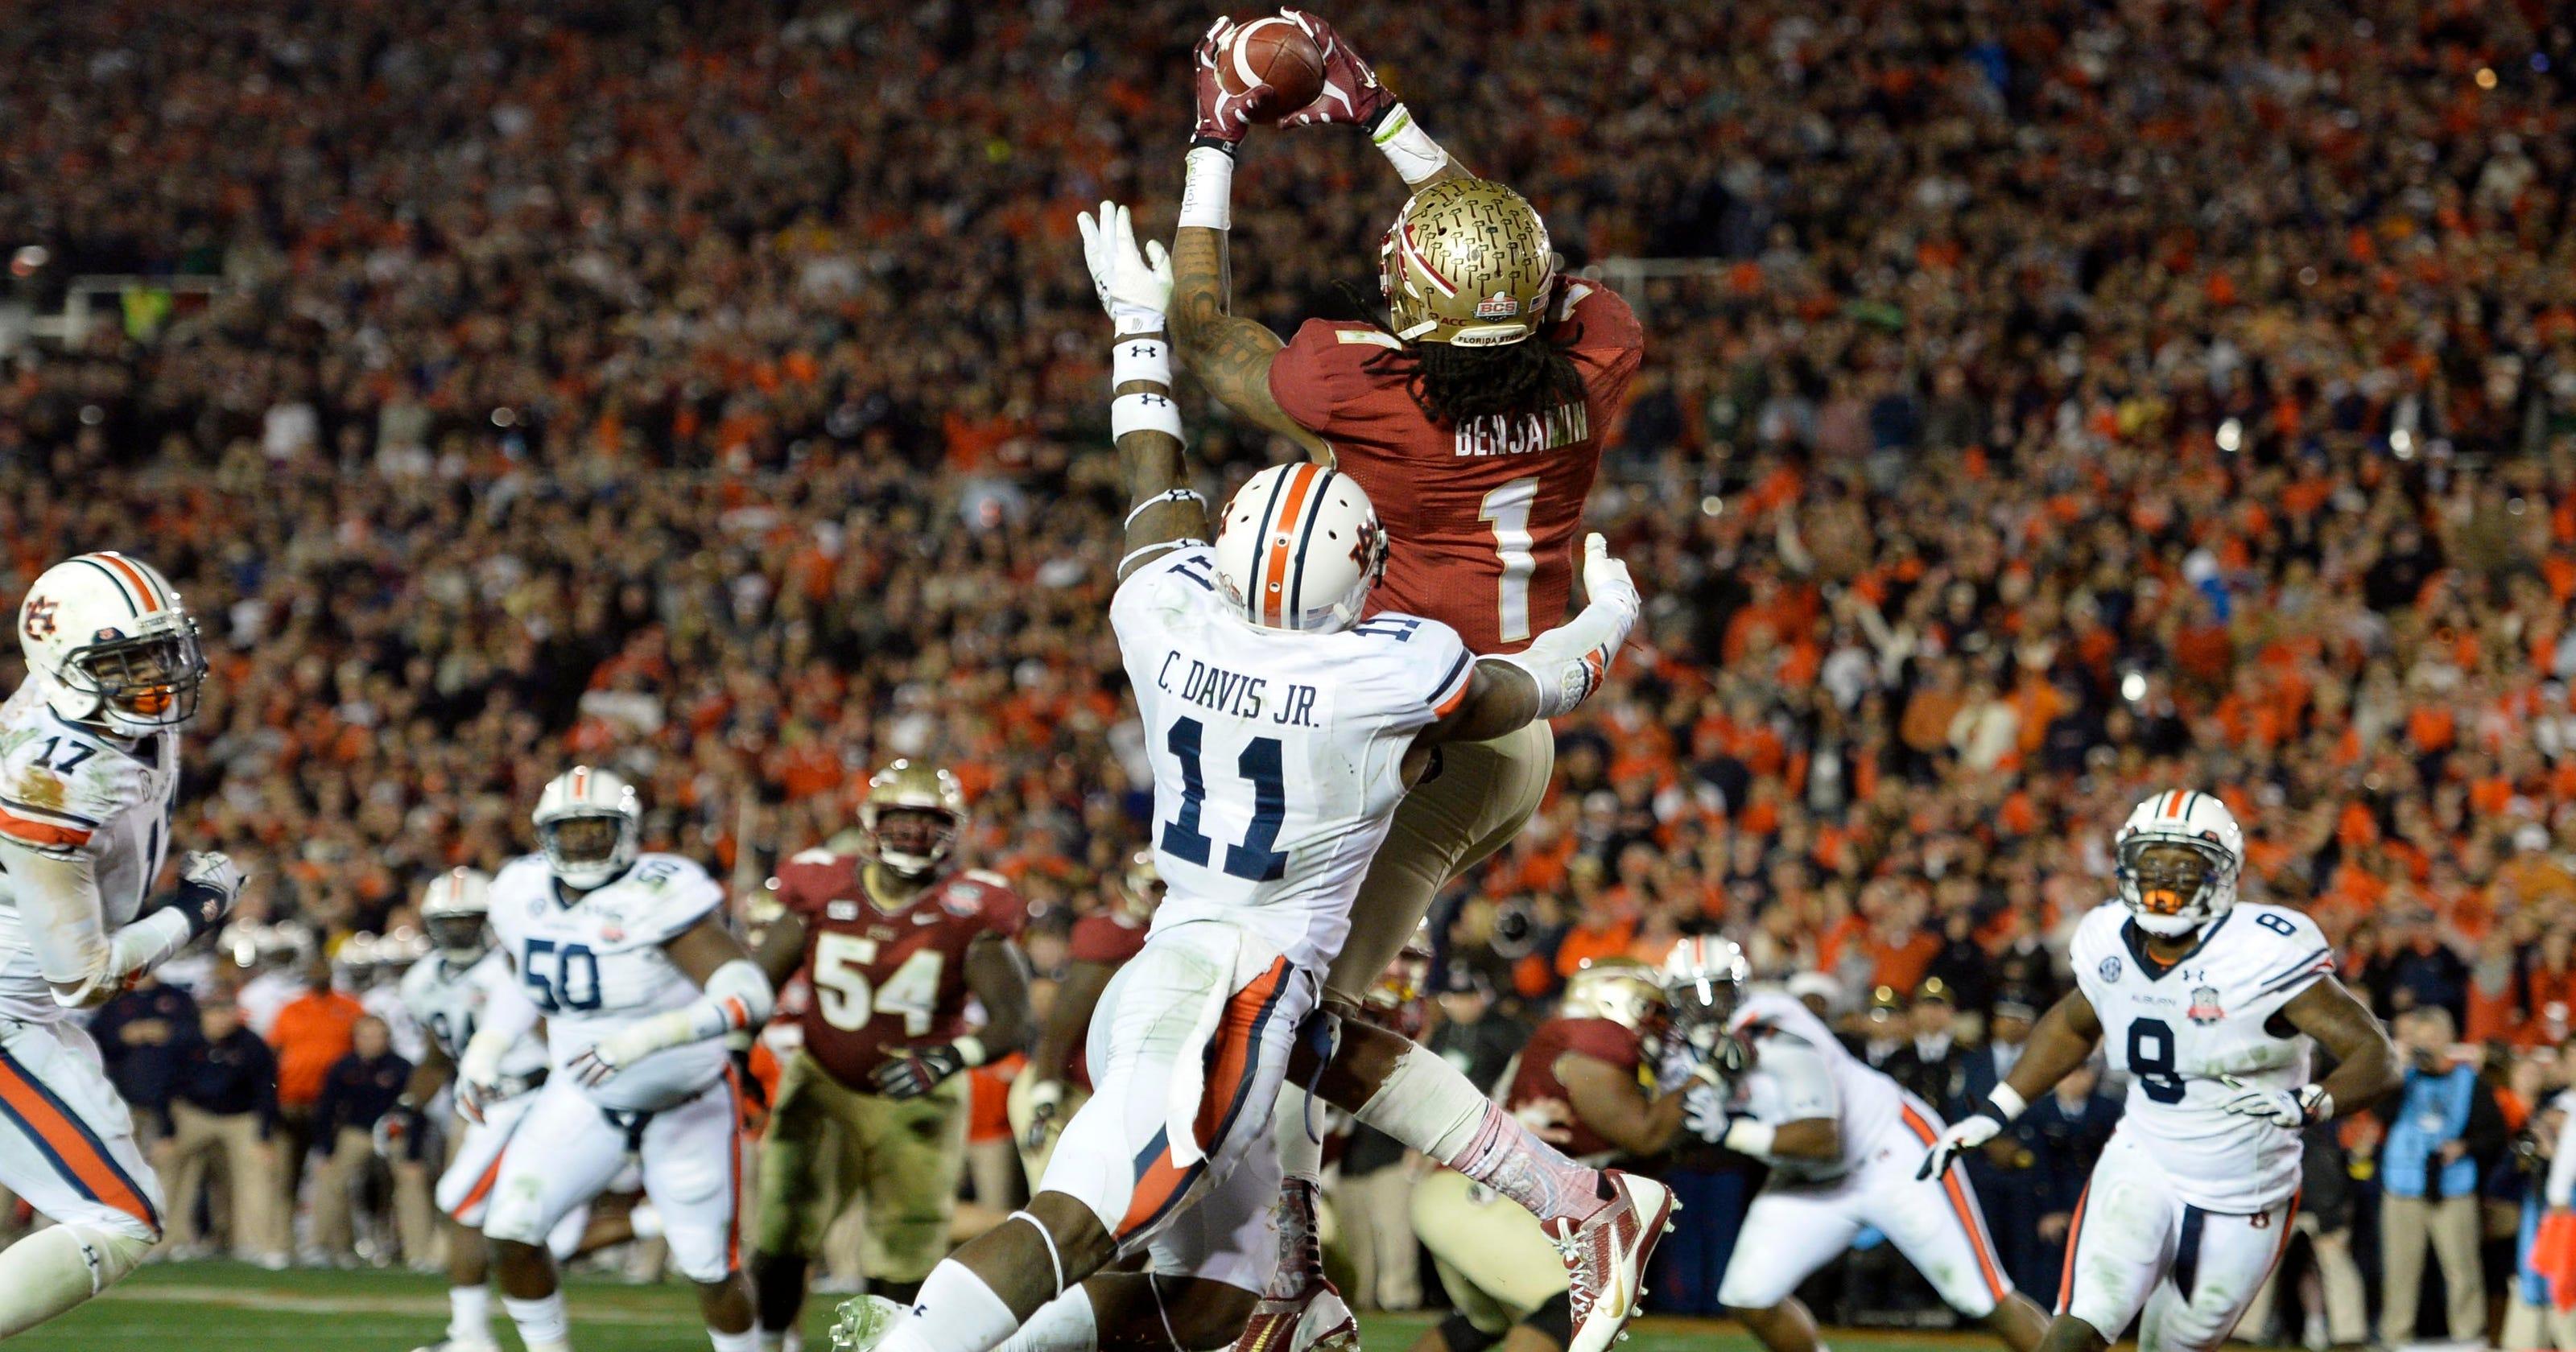 Reports: Florida State's Kelvin Benjamin to enter NFL draft